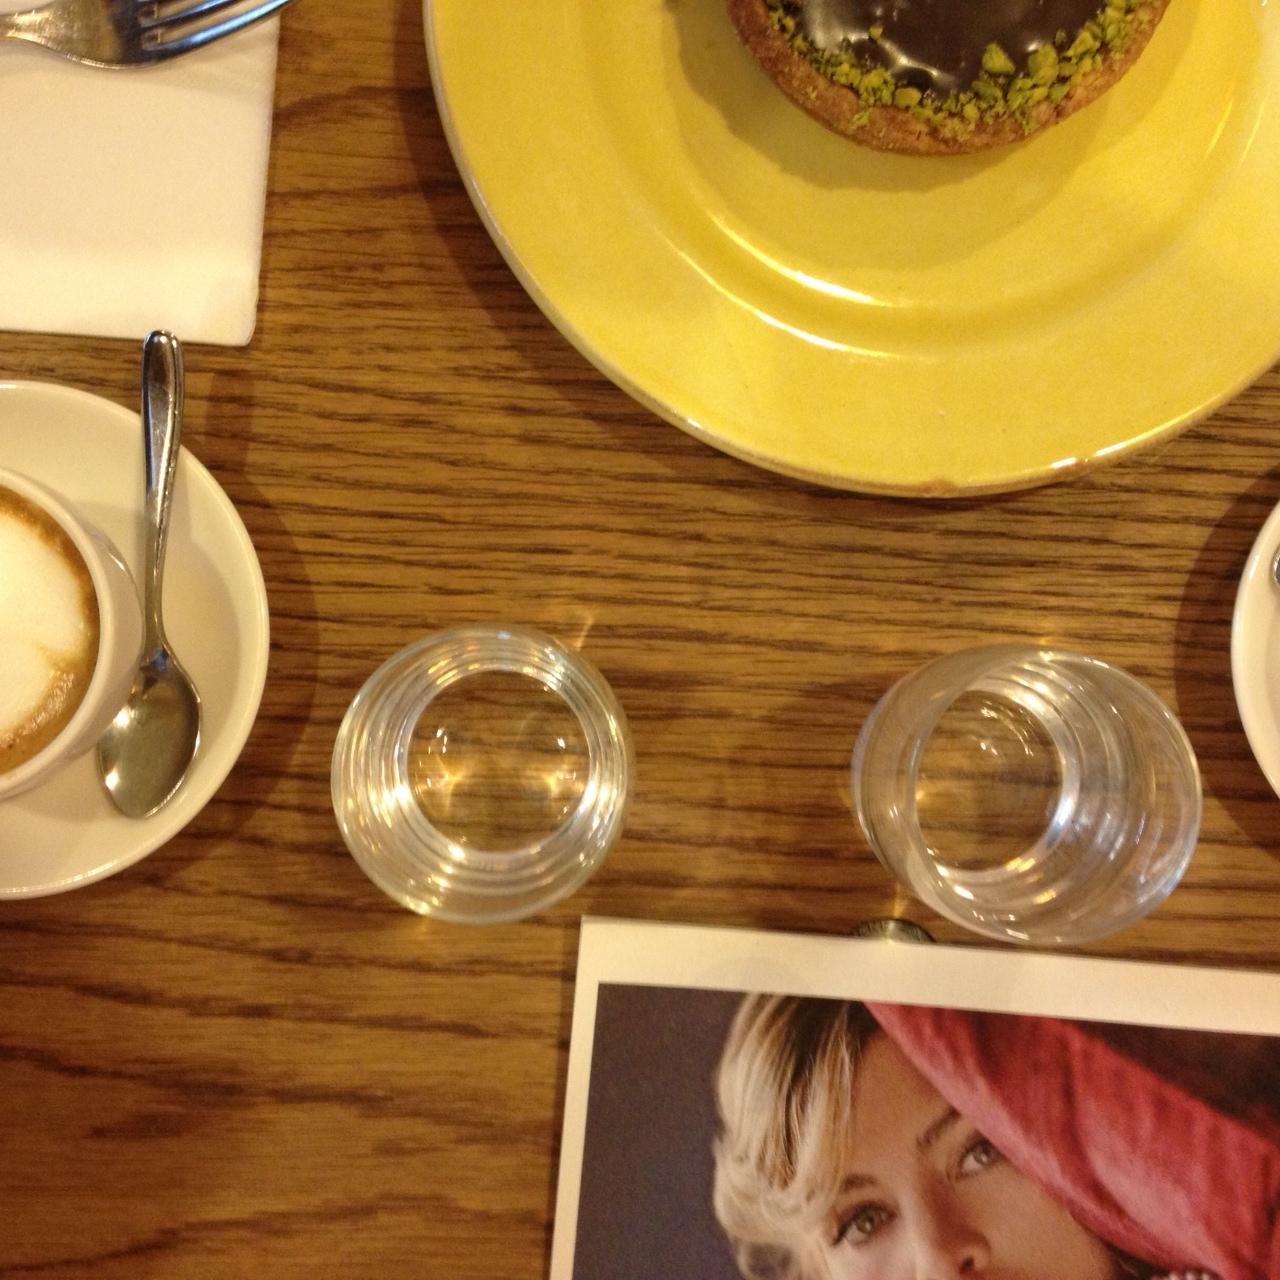 Breakfast at Pasta Madre